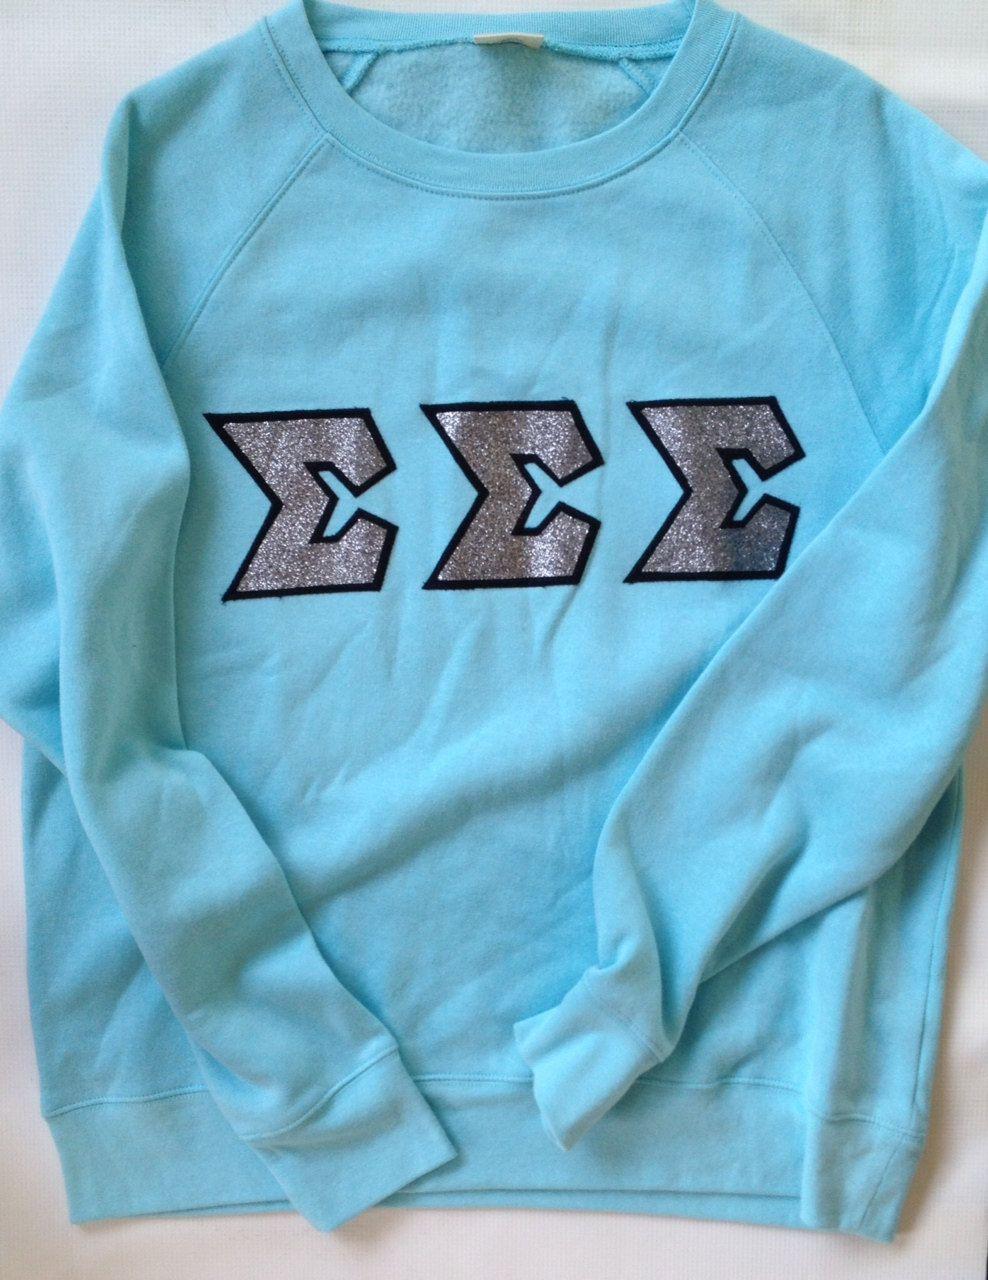 Tri Sigma Letters : sigma, letters, Sigma, Glitter, Letter, Sweatshirt, RobinsNestAK, Etsy,, .00, Greek, Shirts,, Sigma,, Sweatshirts